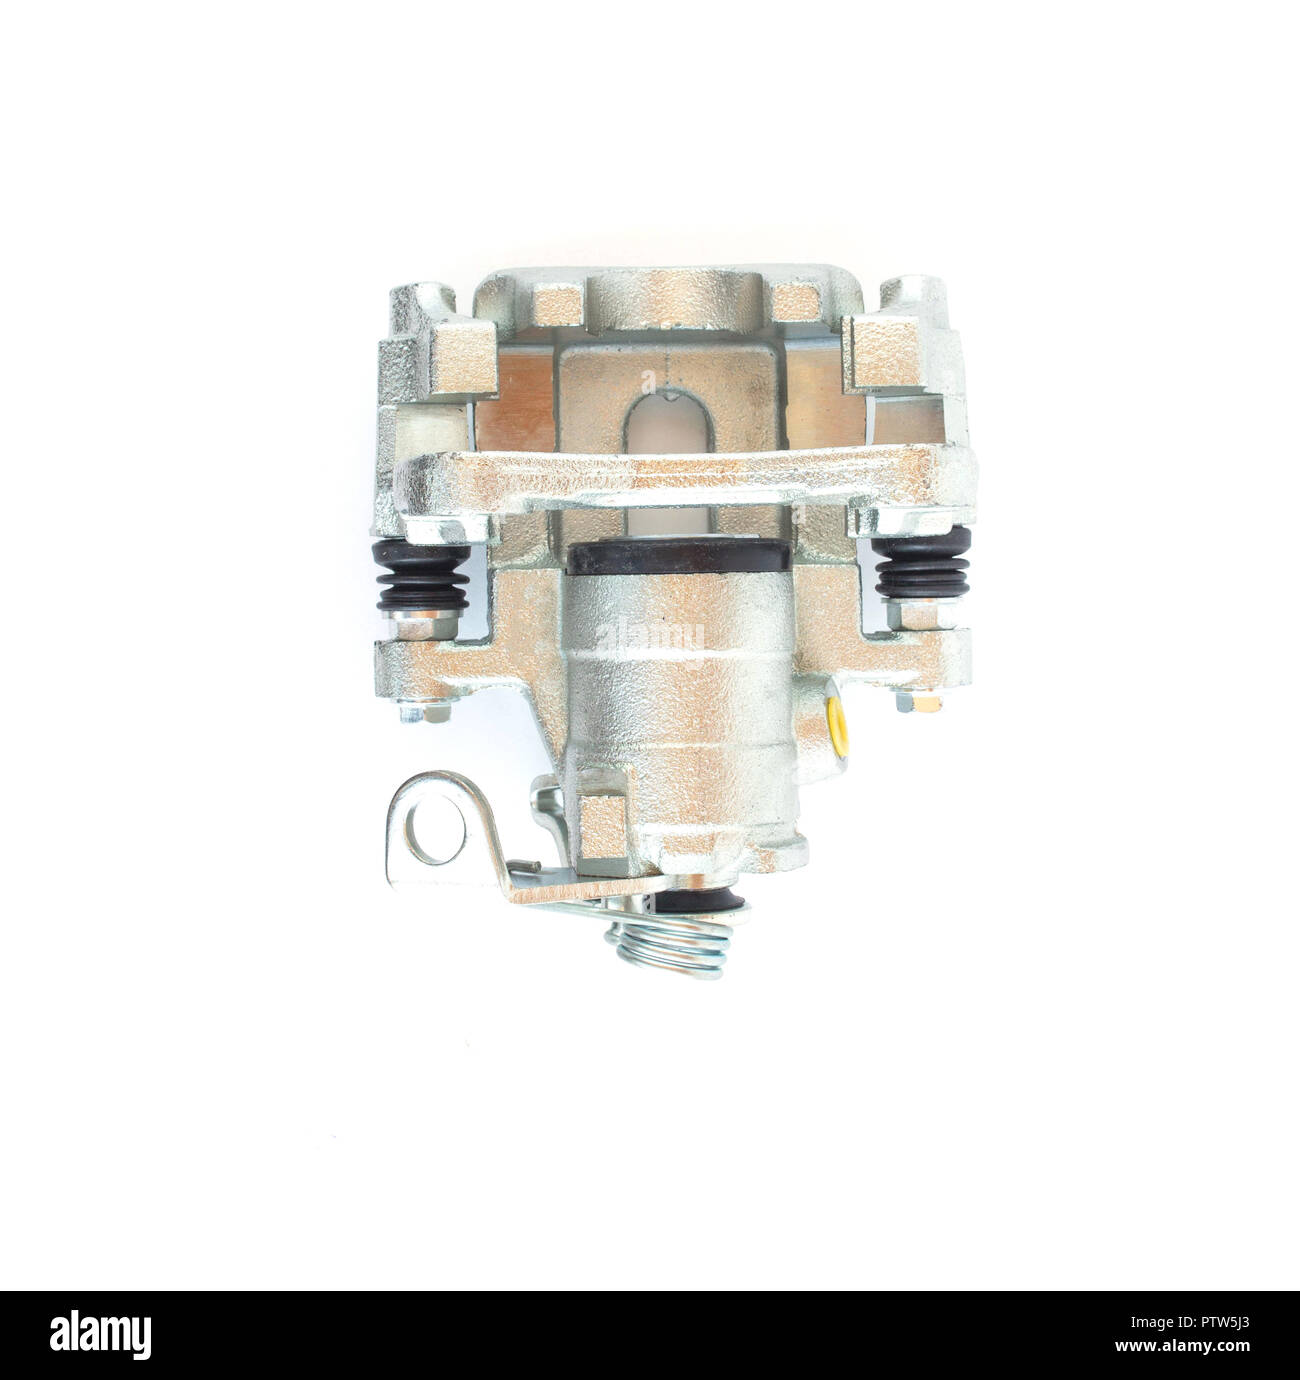 Car brake caliper on white background, isolate - Stock Image